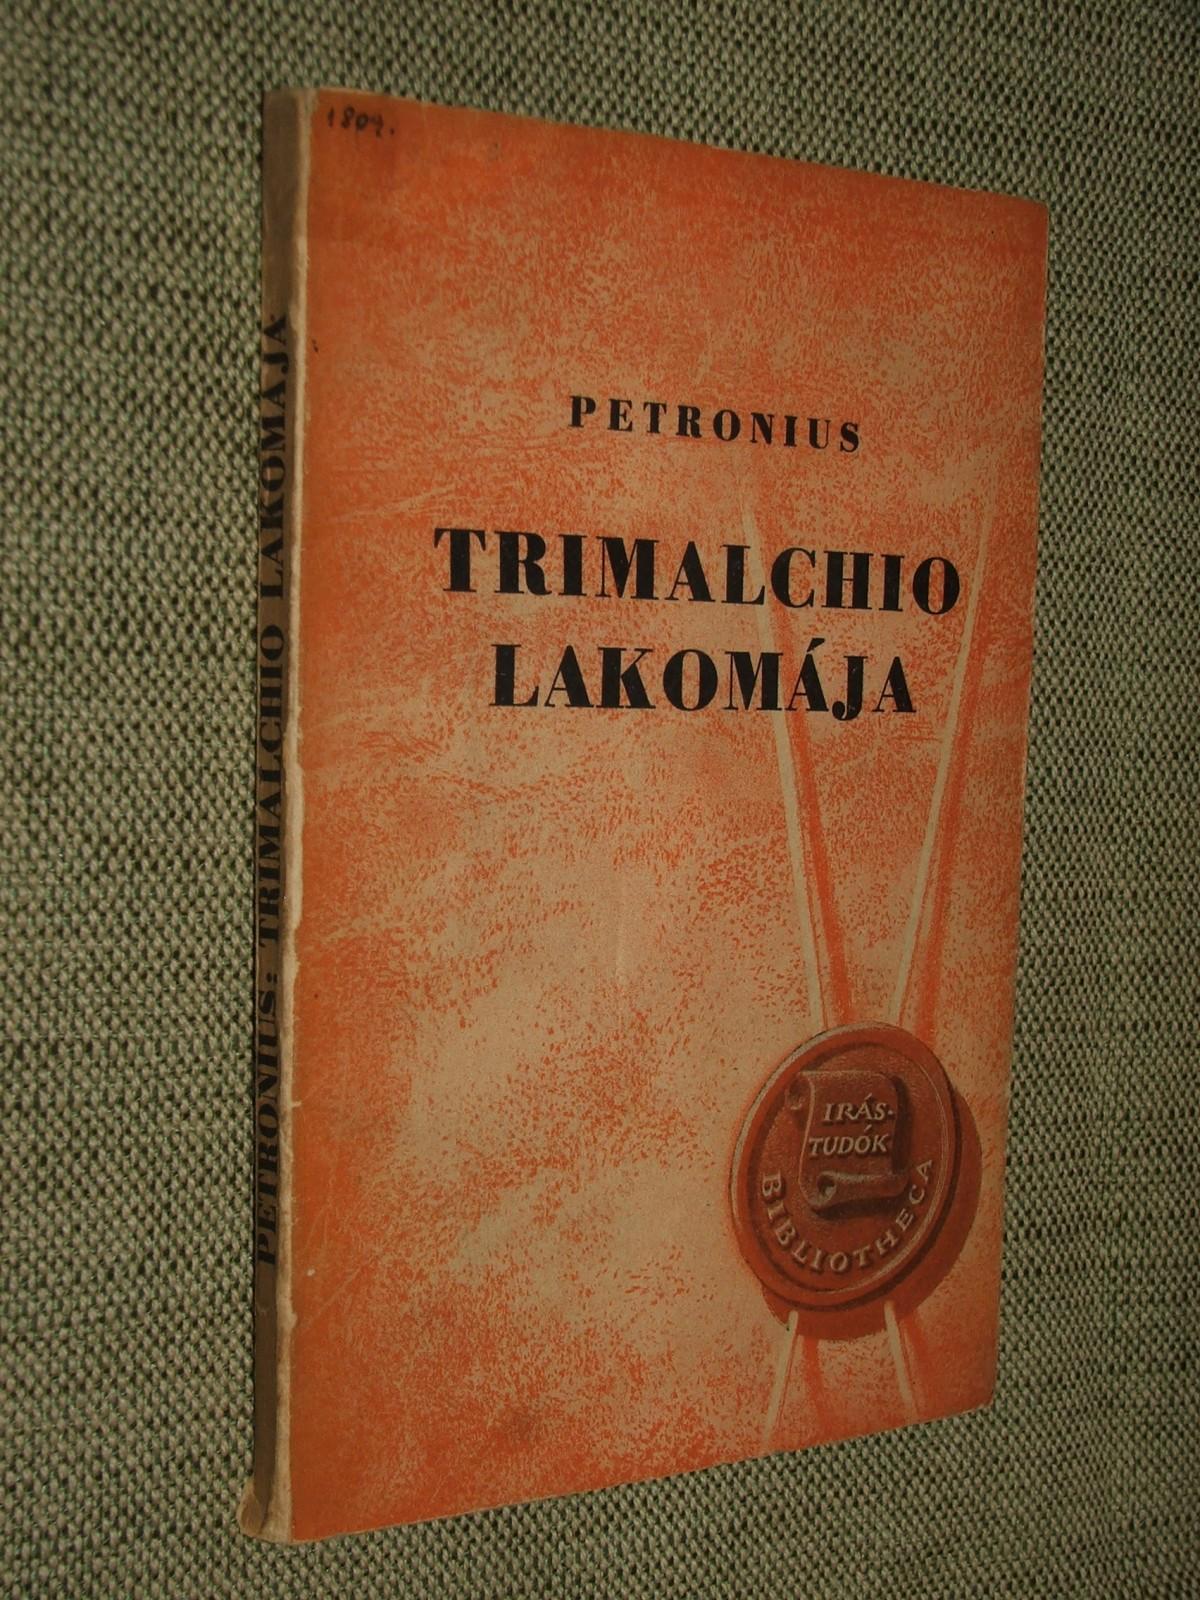 PETRONIUS (Arbiter): Trimalchio lakomája